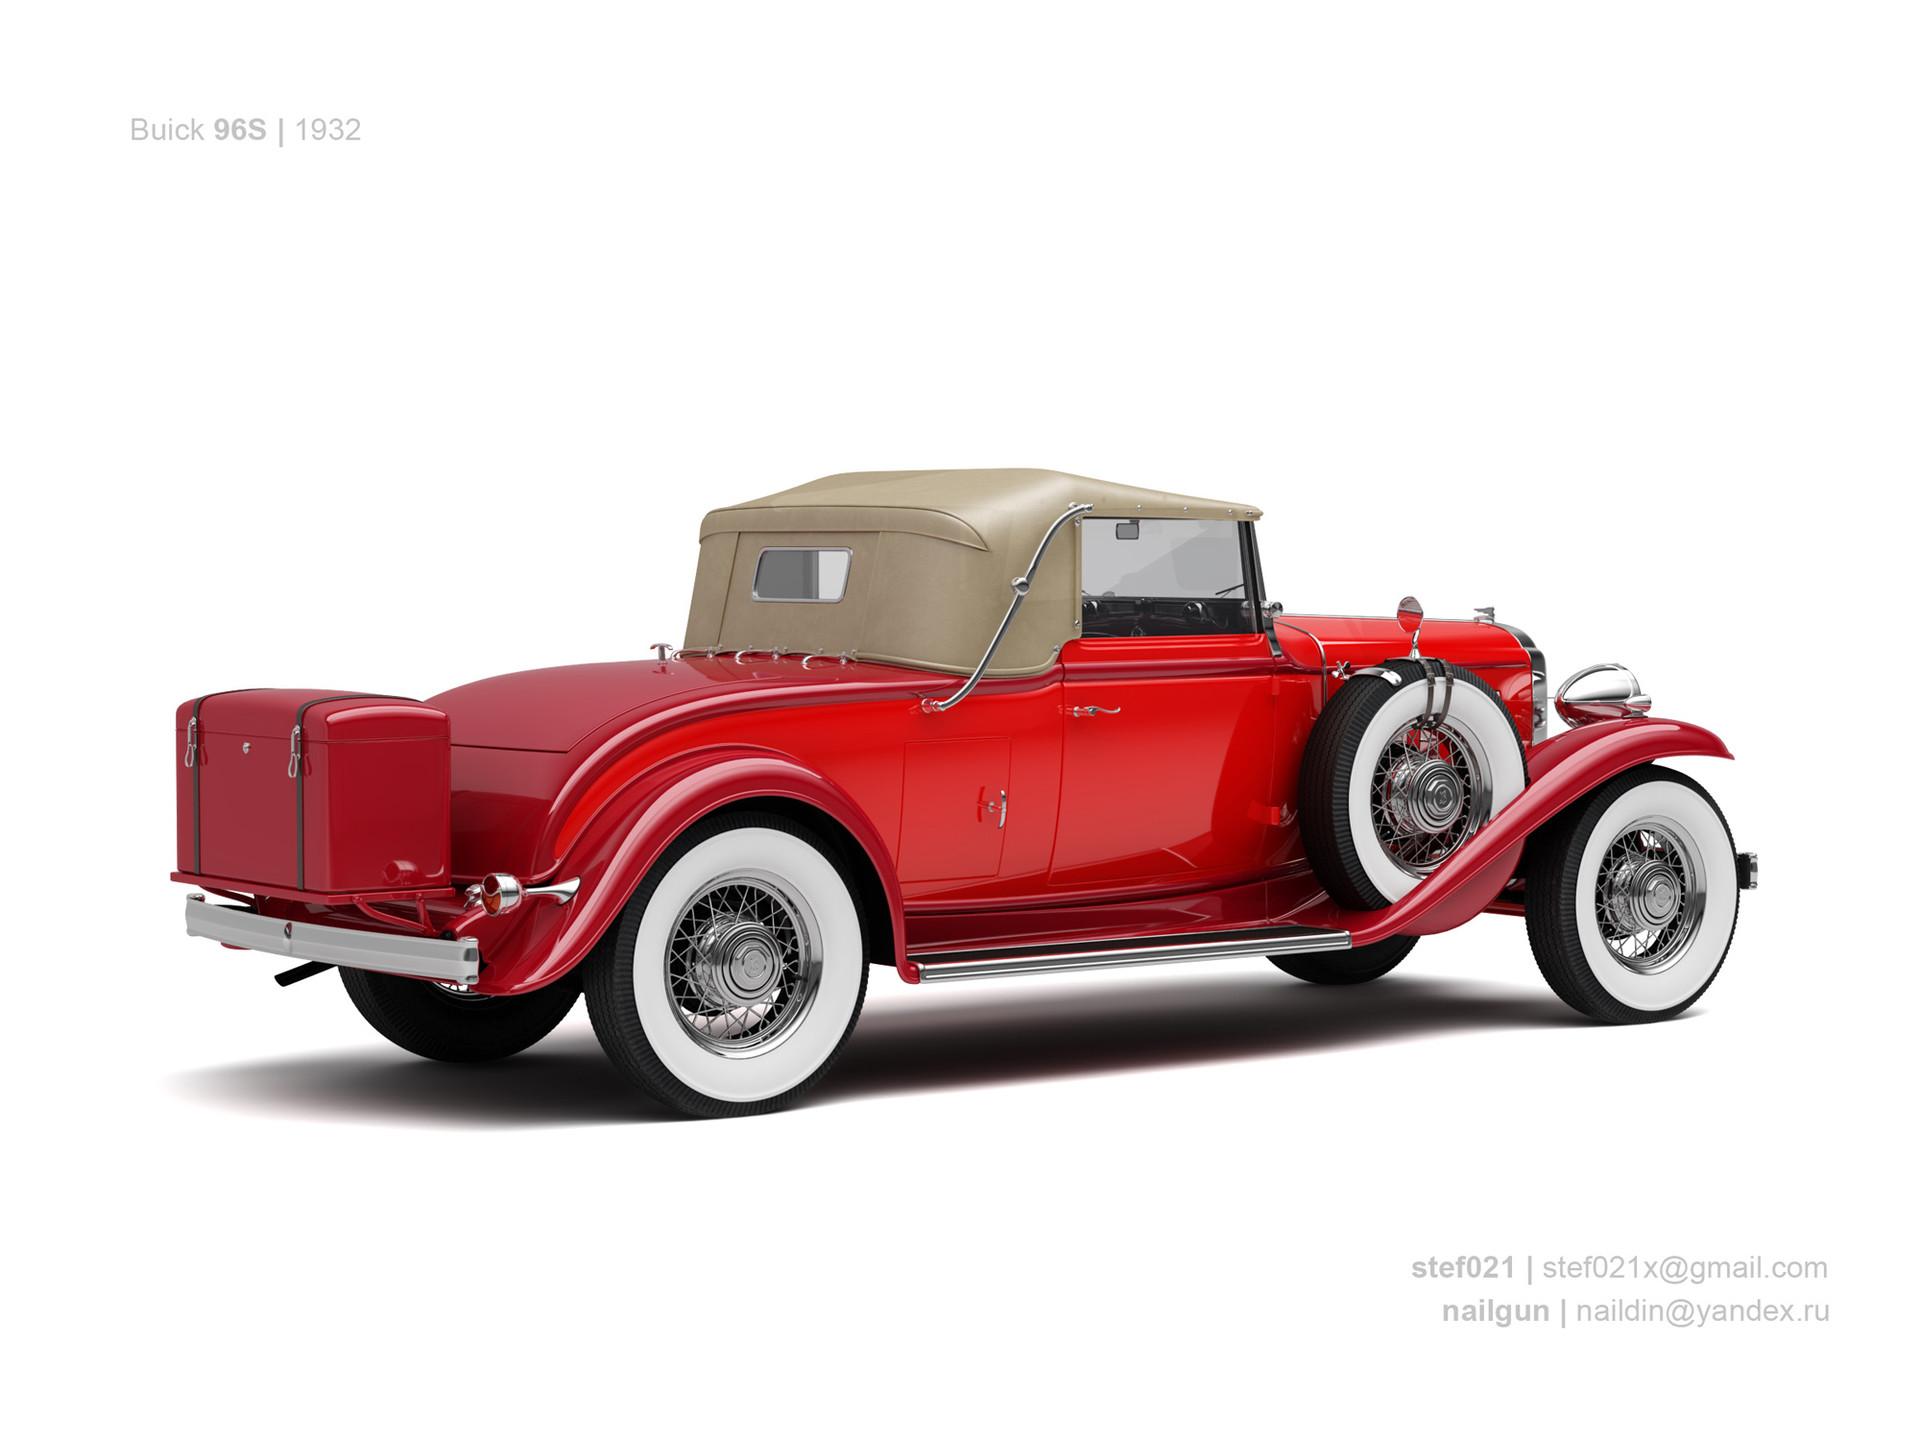 Nail khusnutdinov usa buick 69s 1932 1